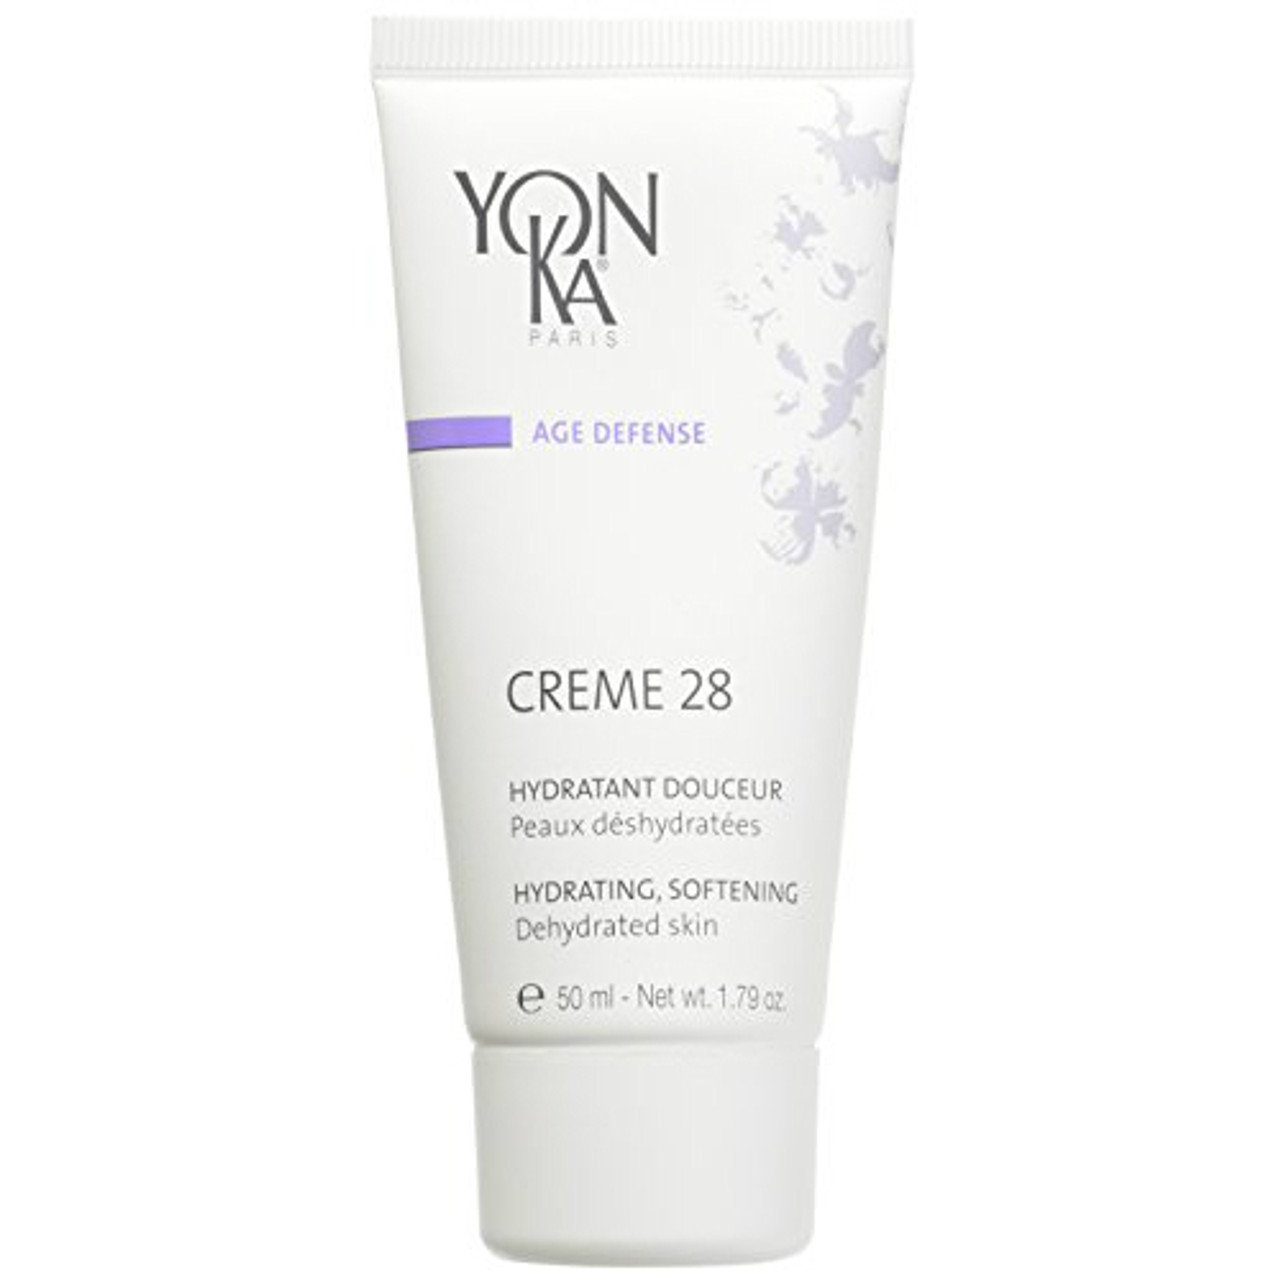 Yon-ka Creme 28 Hydrating Softening 1.79 oz